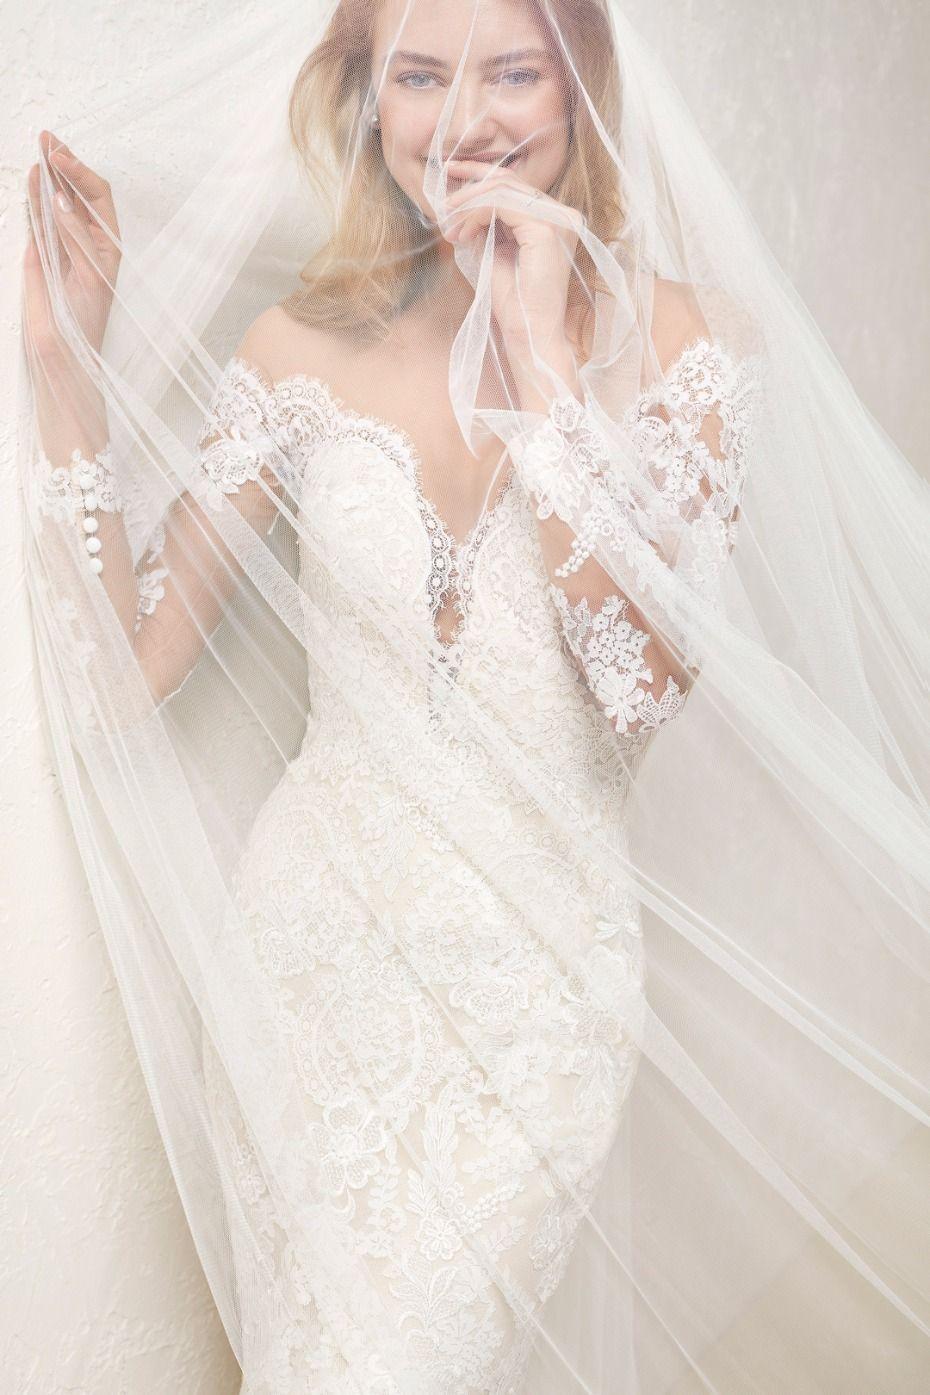 Lace v cut wedding dress and wedding veil pronovias wedding dress